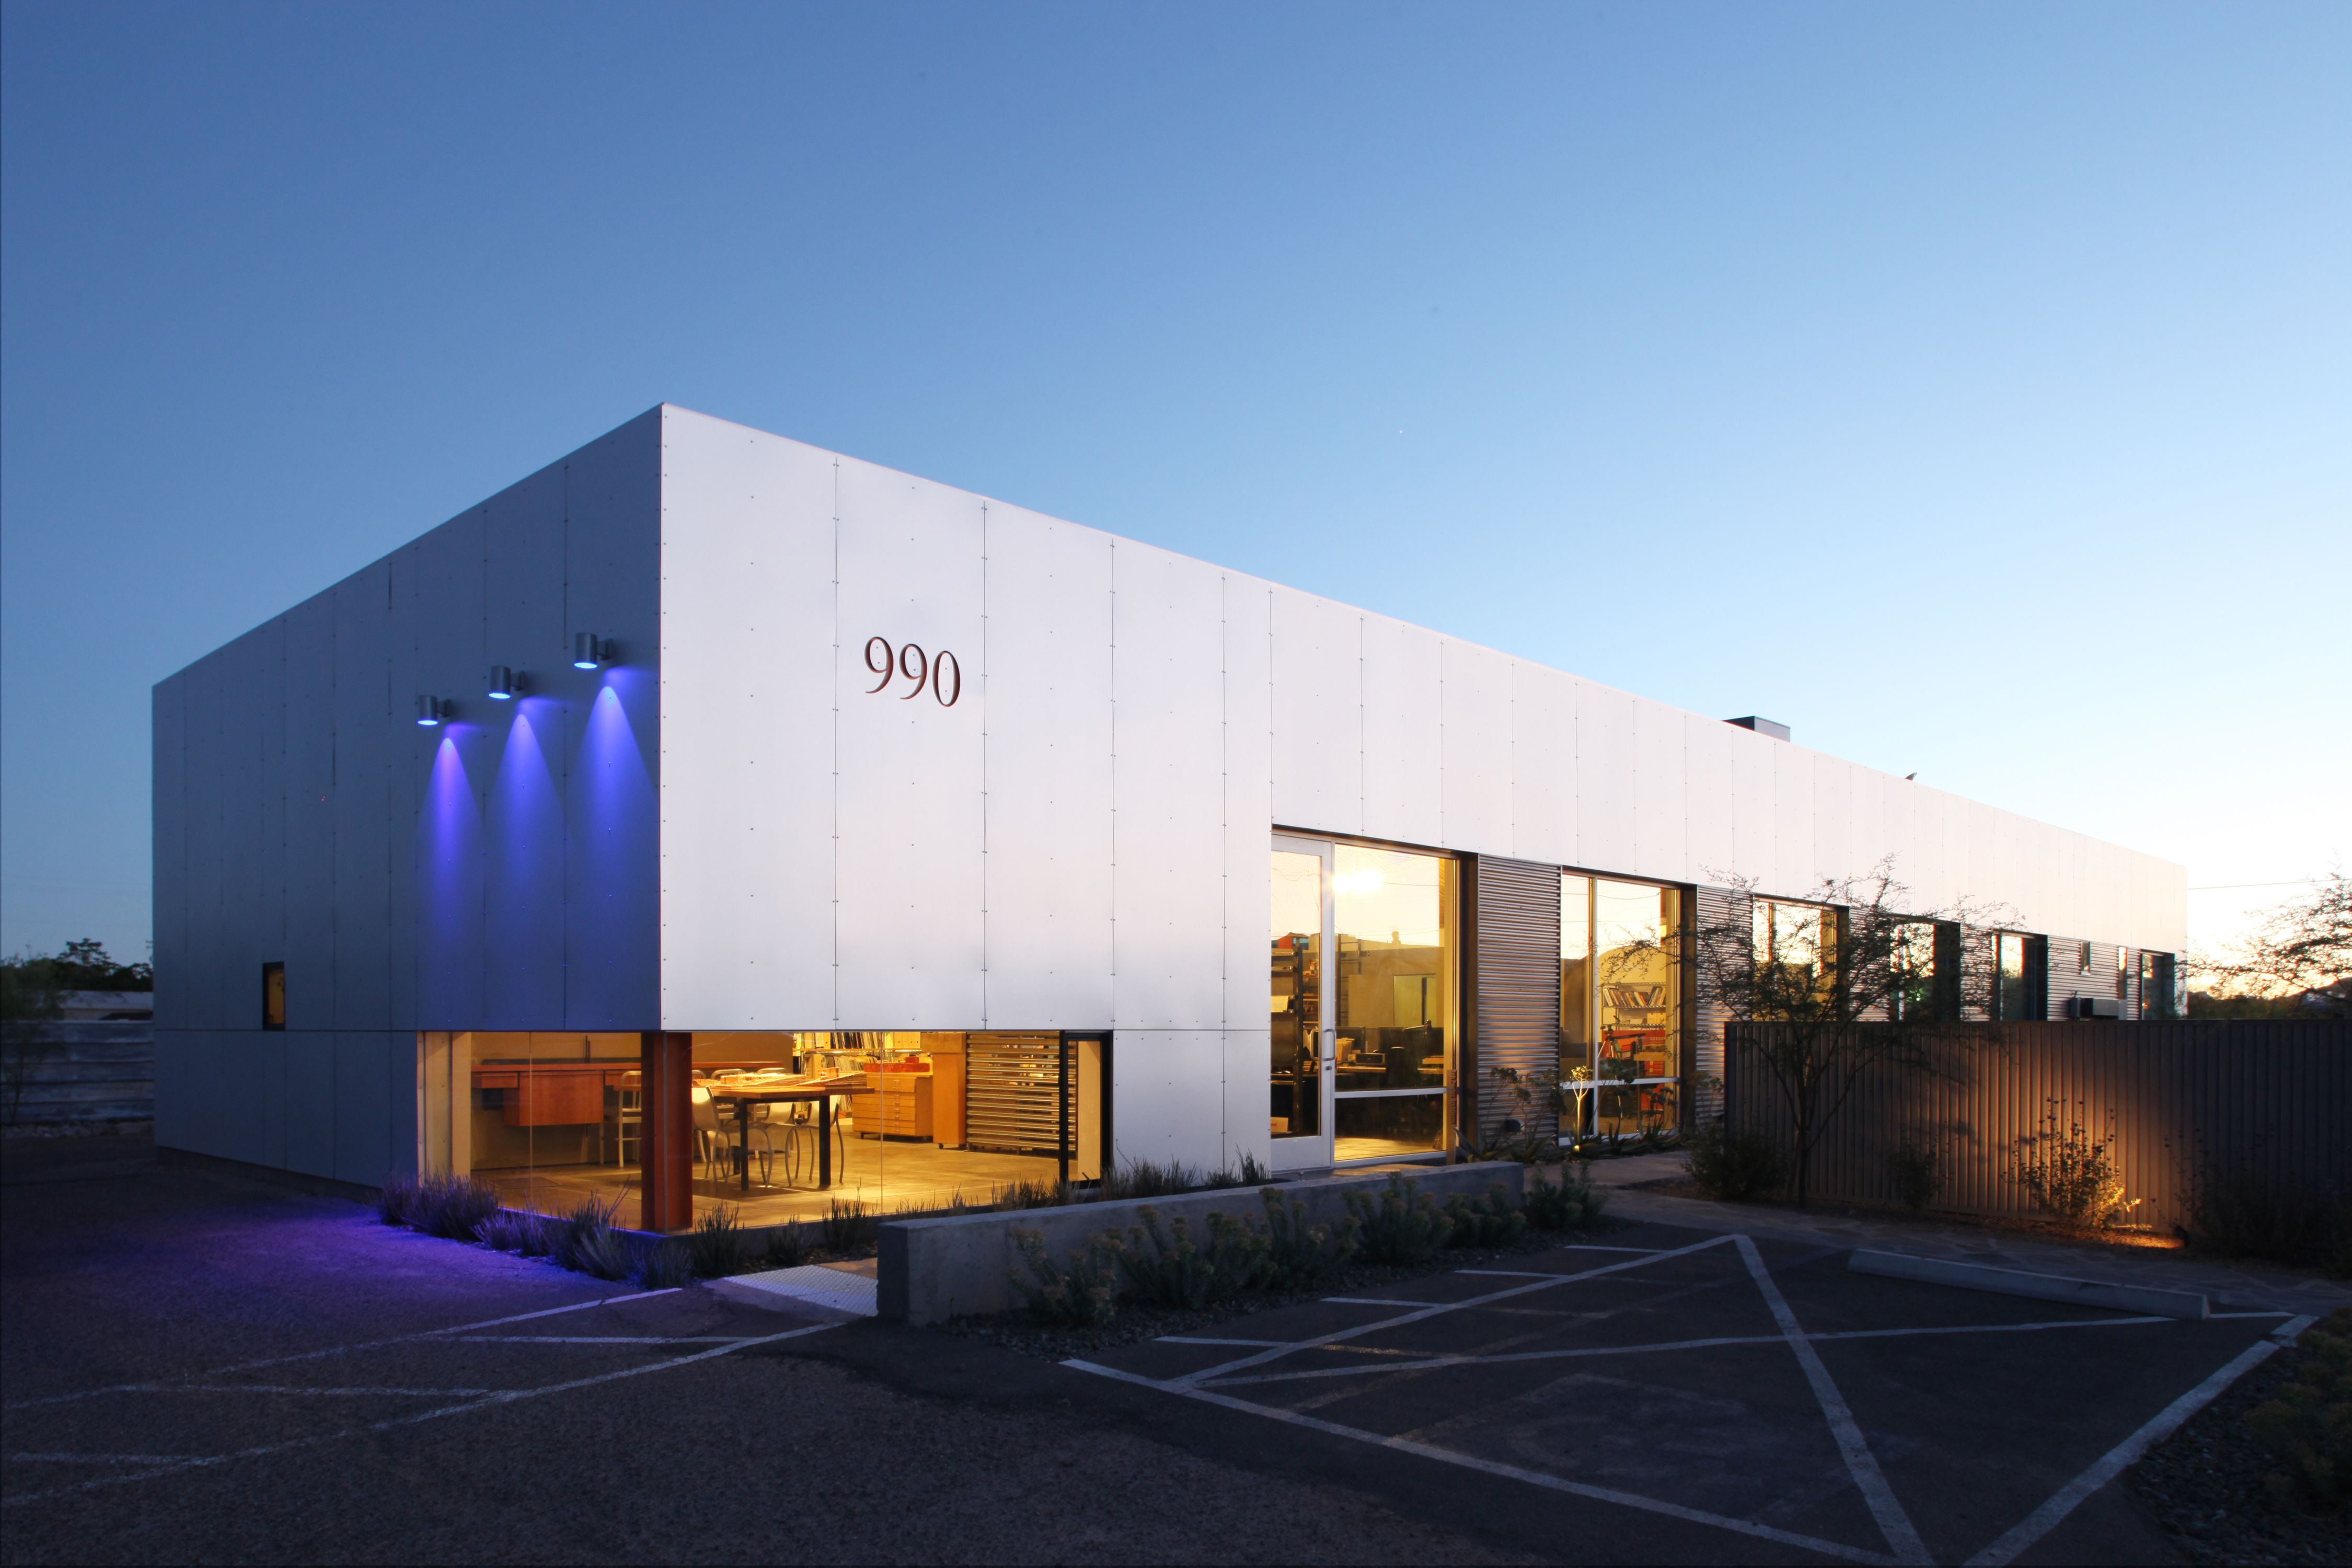 Auto Service Building : Repurposing an old auto body into retail google search